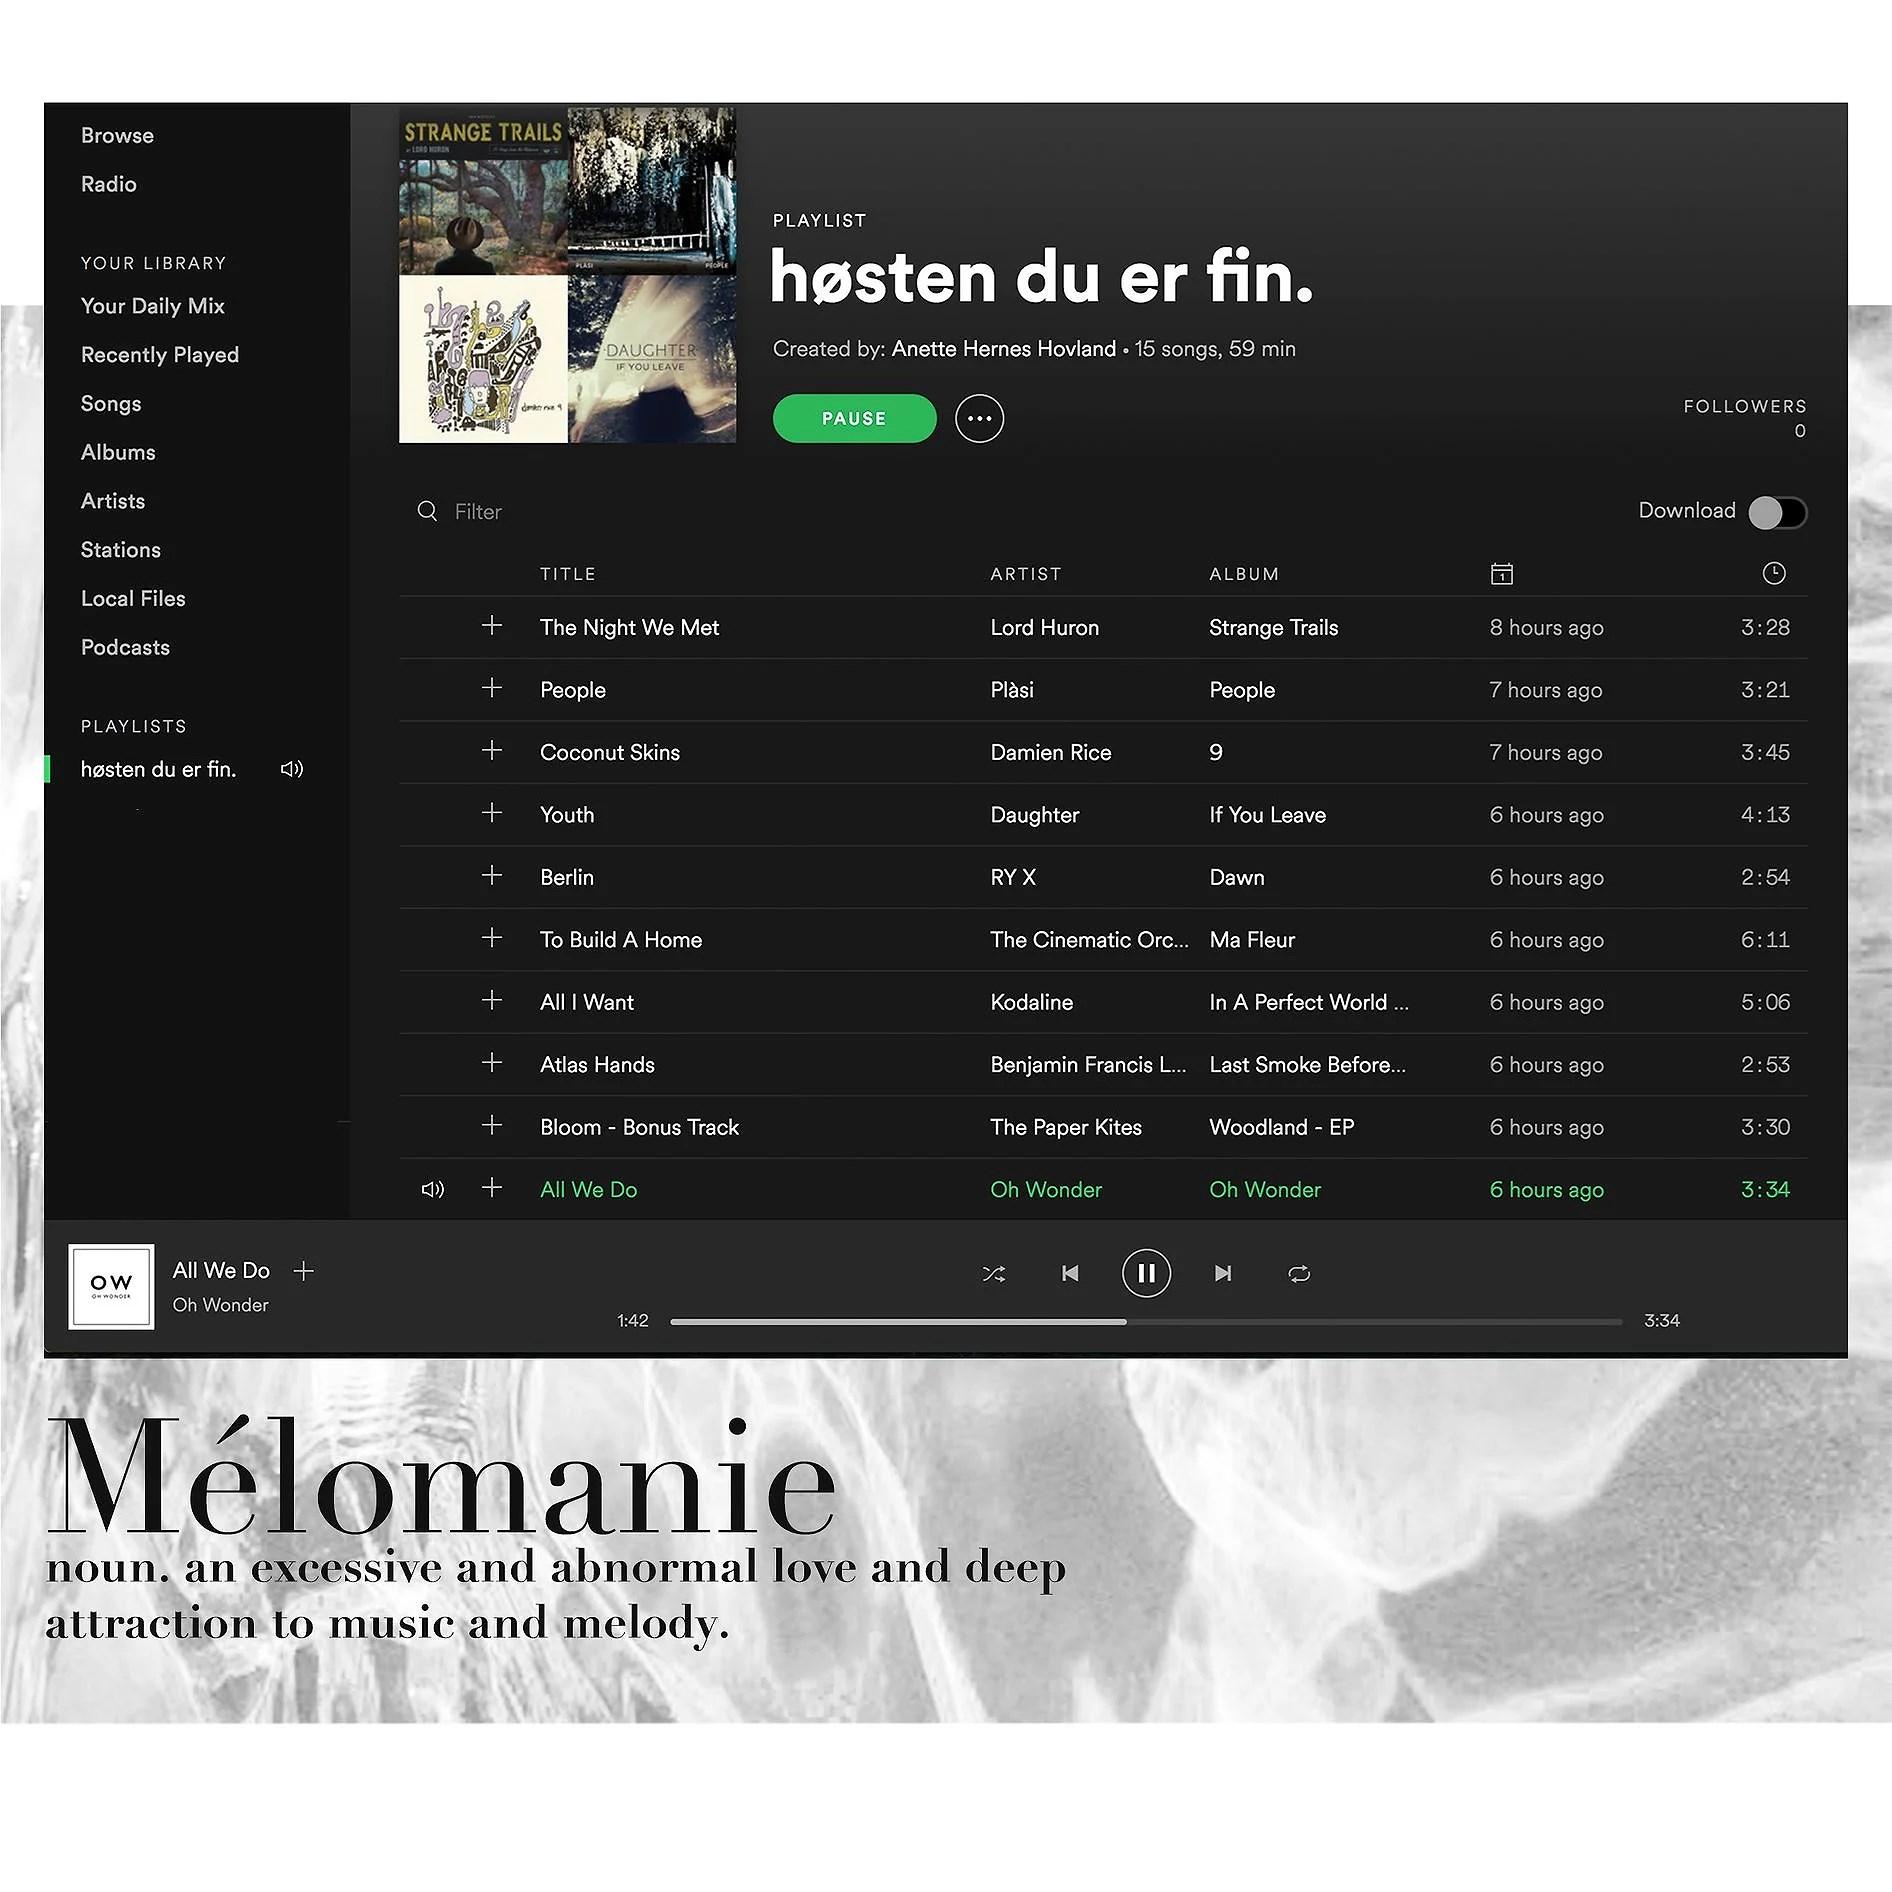 the playlist.